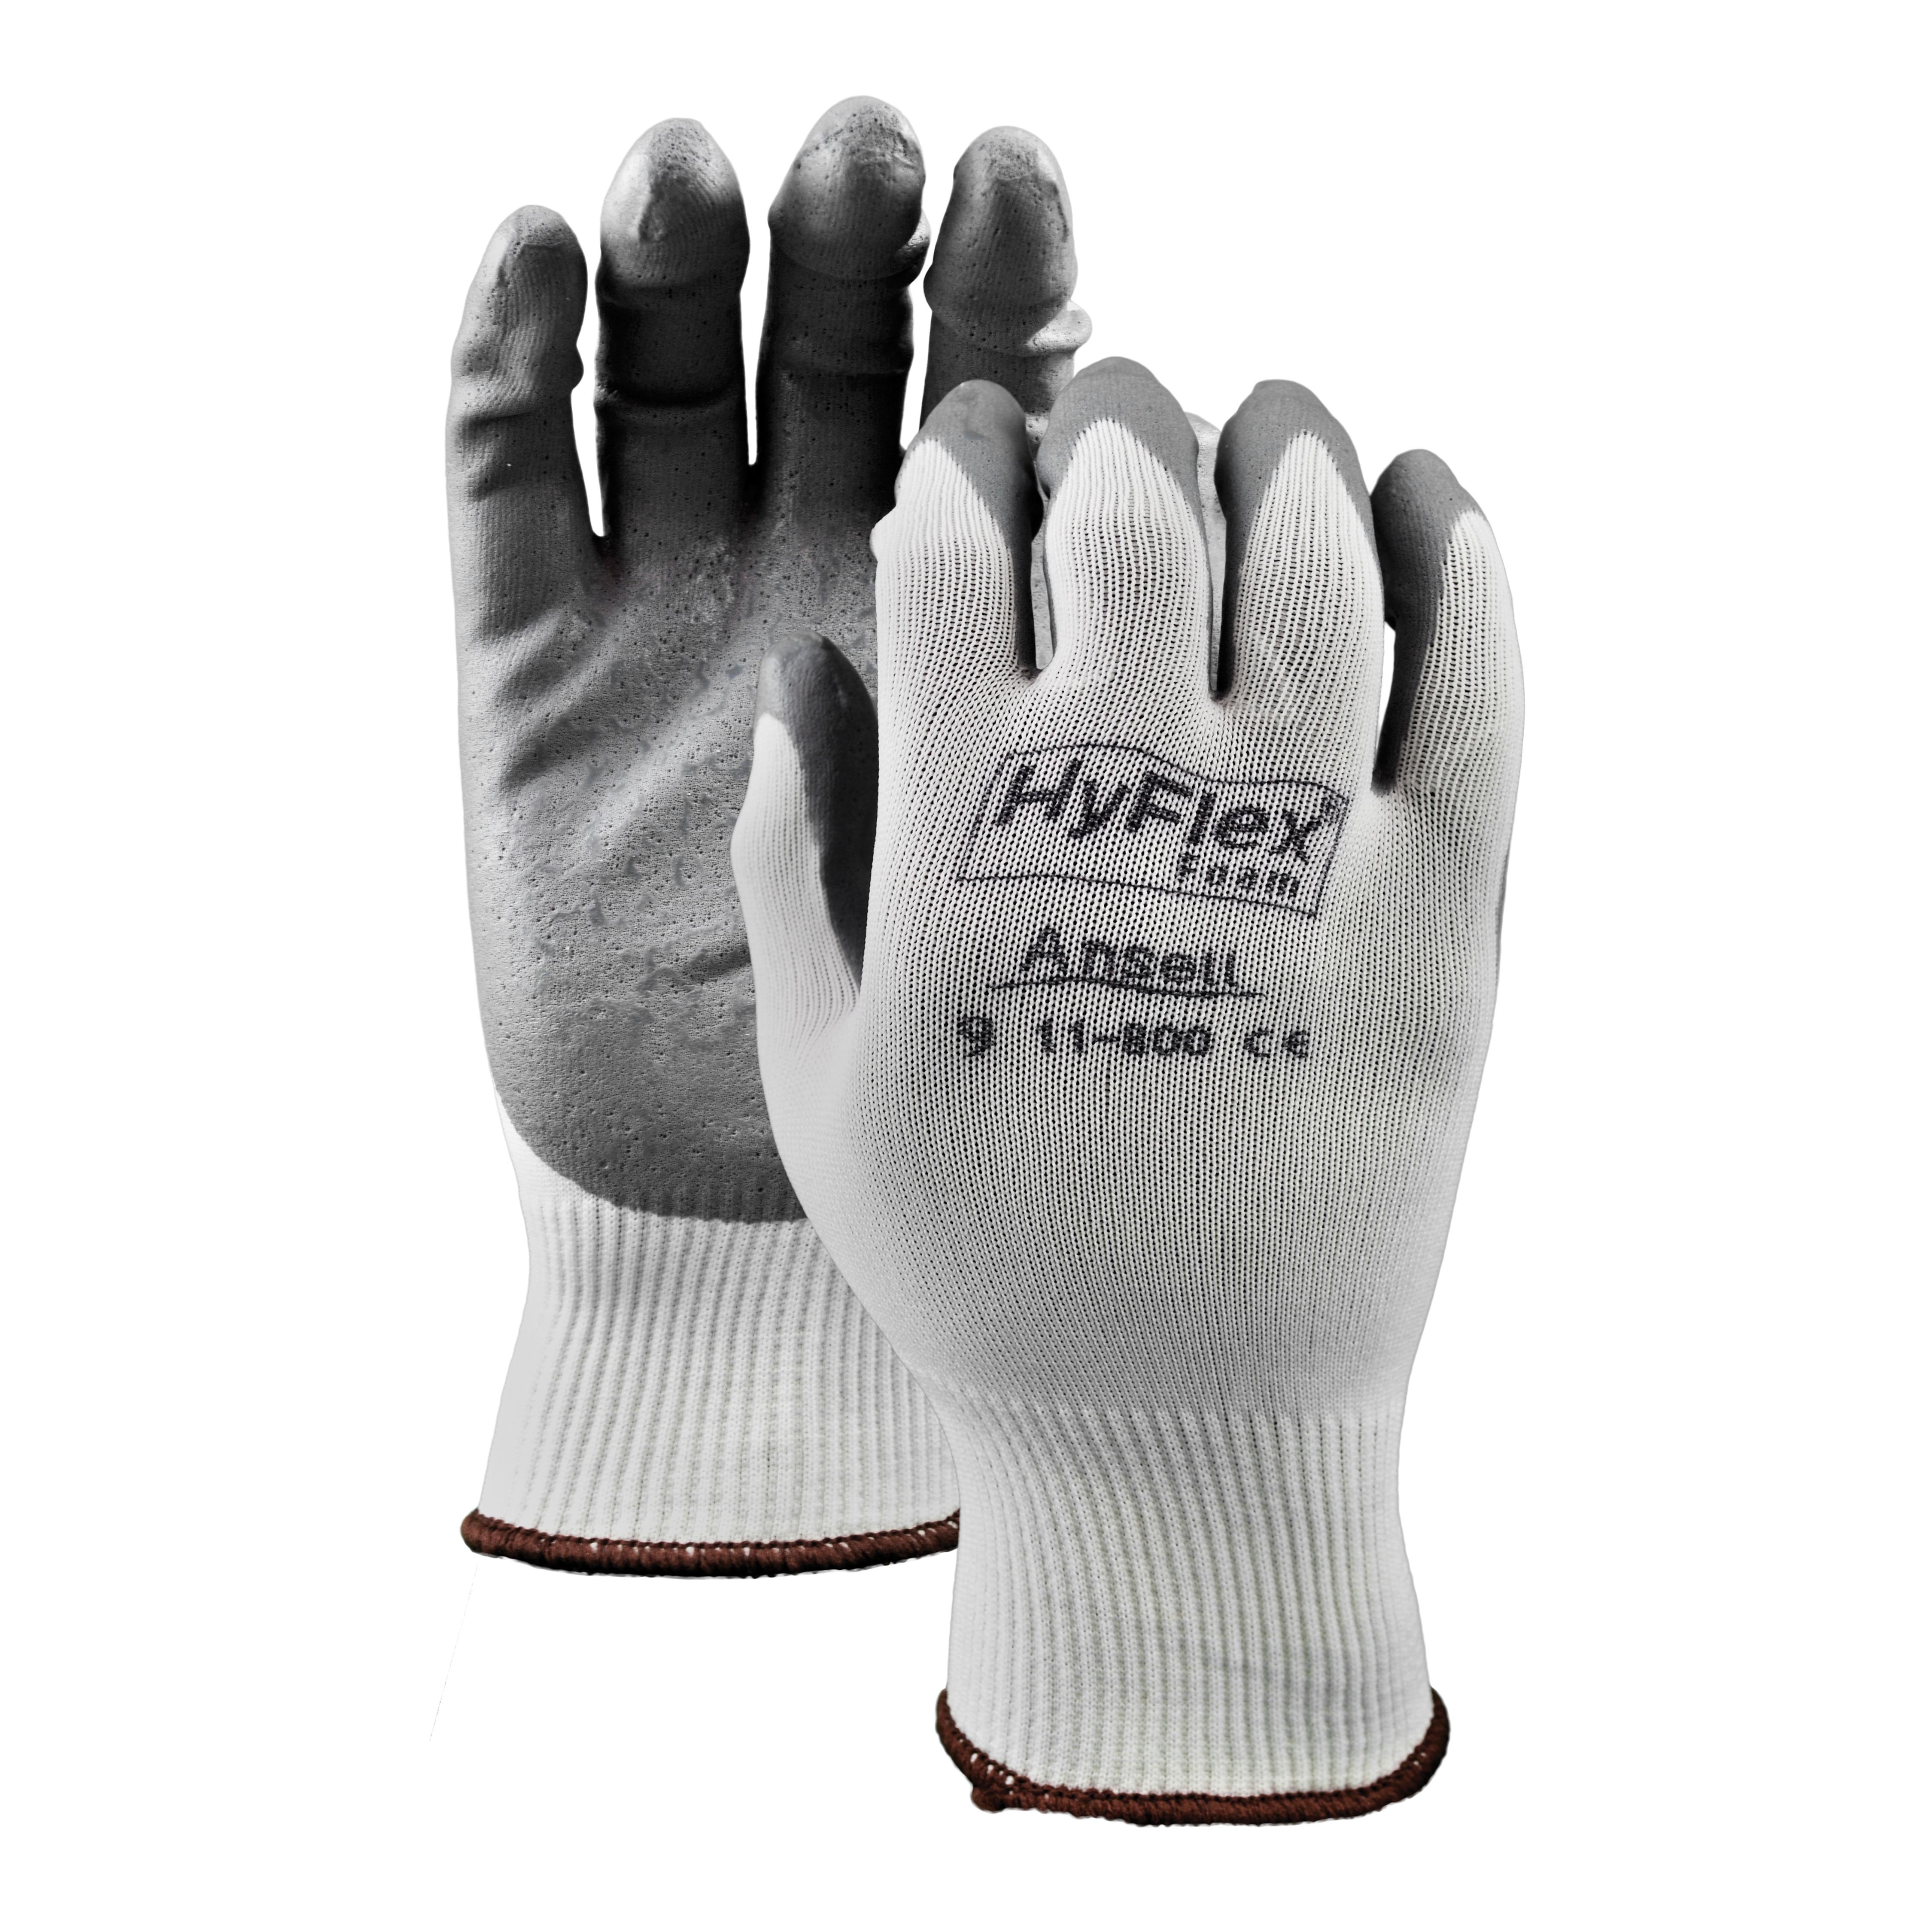 Ansell HyFlex® 11800-09 Light Duty General Purpose Gloves, Coated/Multi-Purpose, SZ 9, Foam Nitrile Palm, Nylon Knit Shell, Gray/White, Knit Wrist Cuff, Foam Nitrile Coating, Resists: Abrasion and Puncture, 15 ga Nylon Lining, Open Back